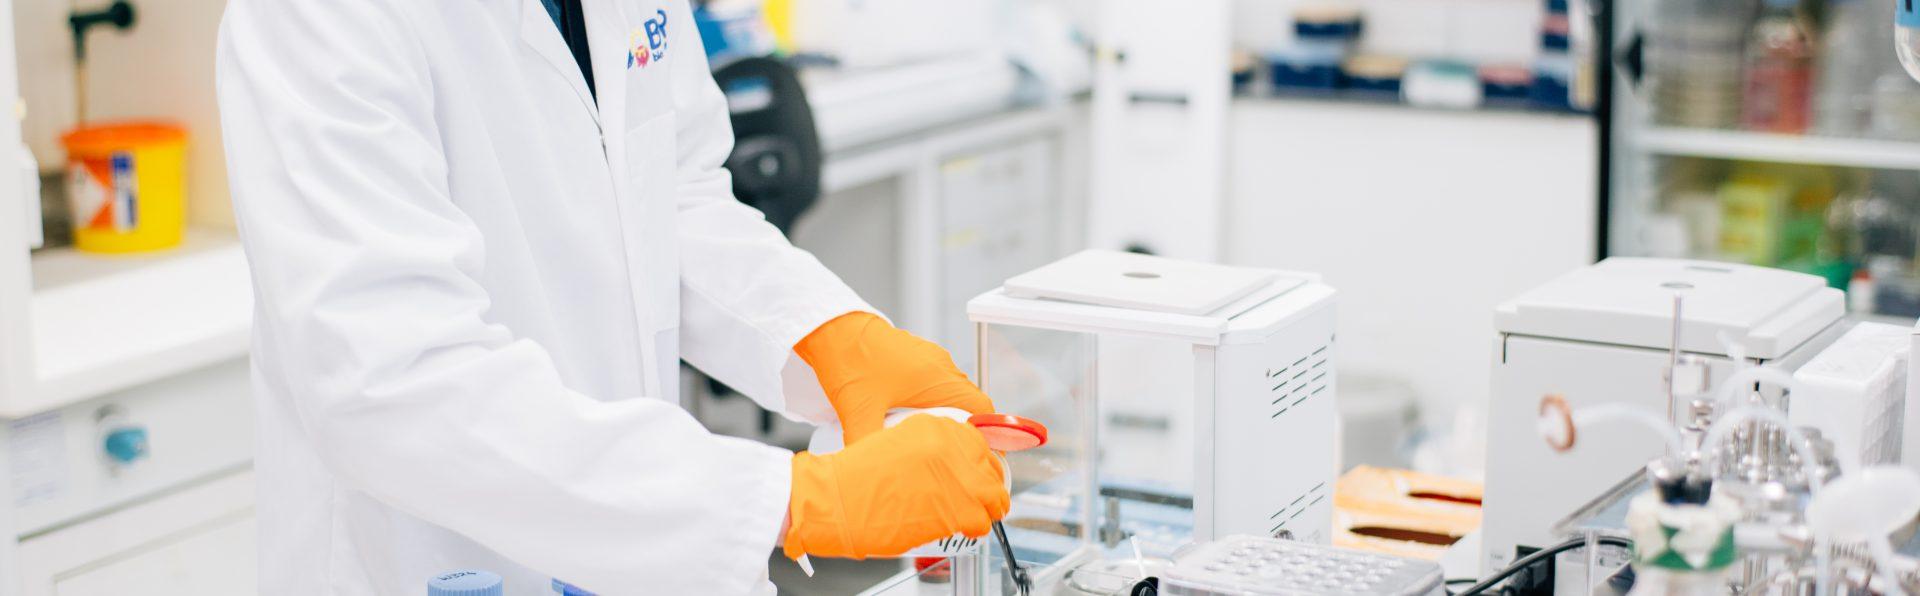 Bioeconomy & Biotech